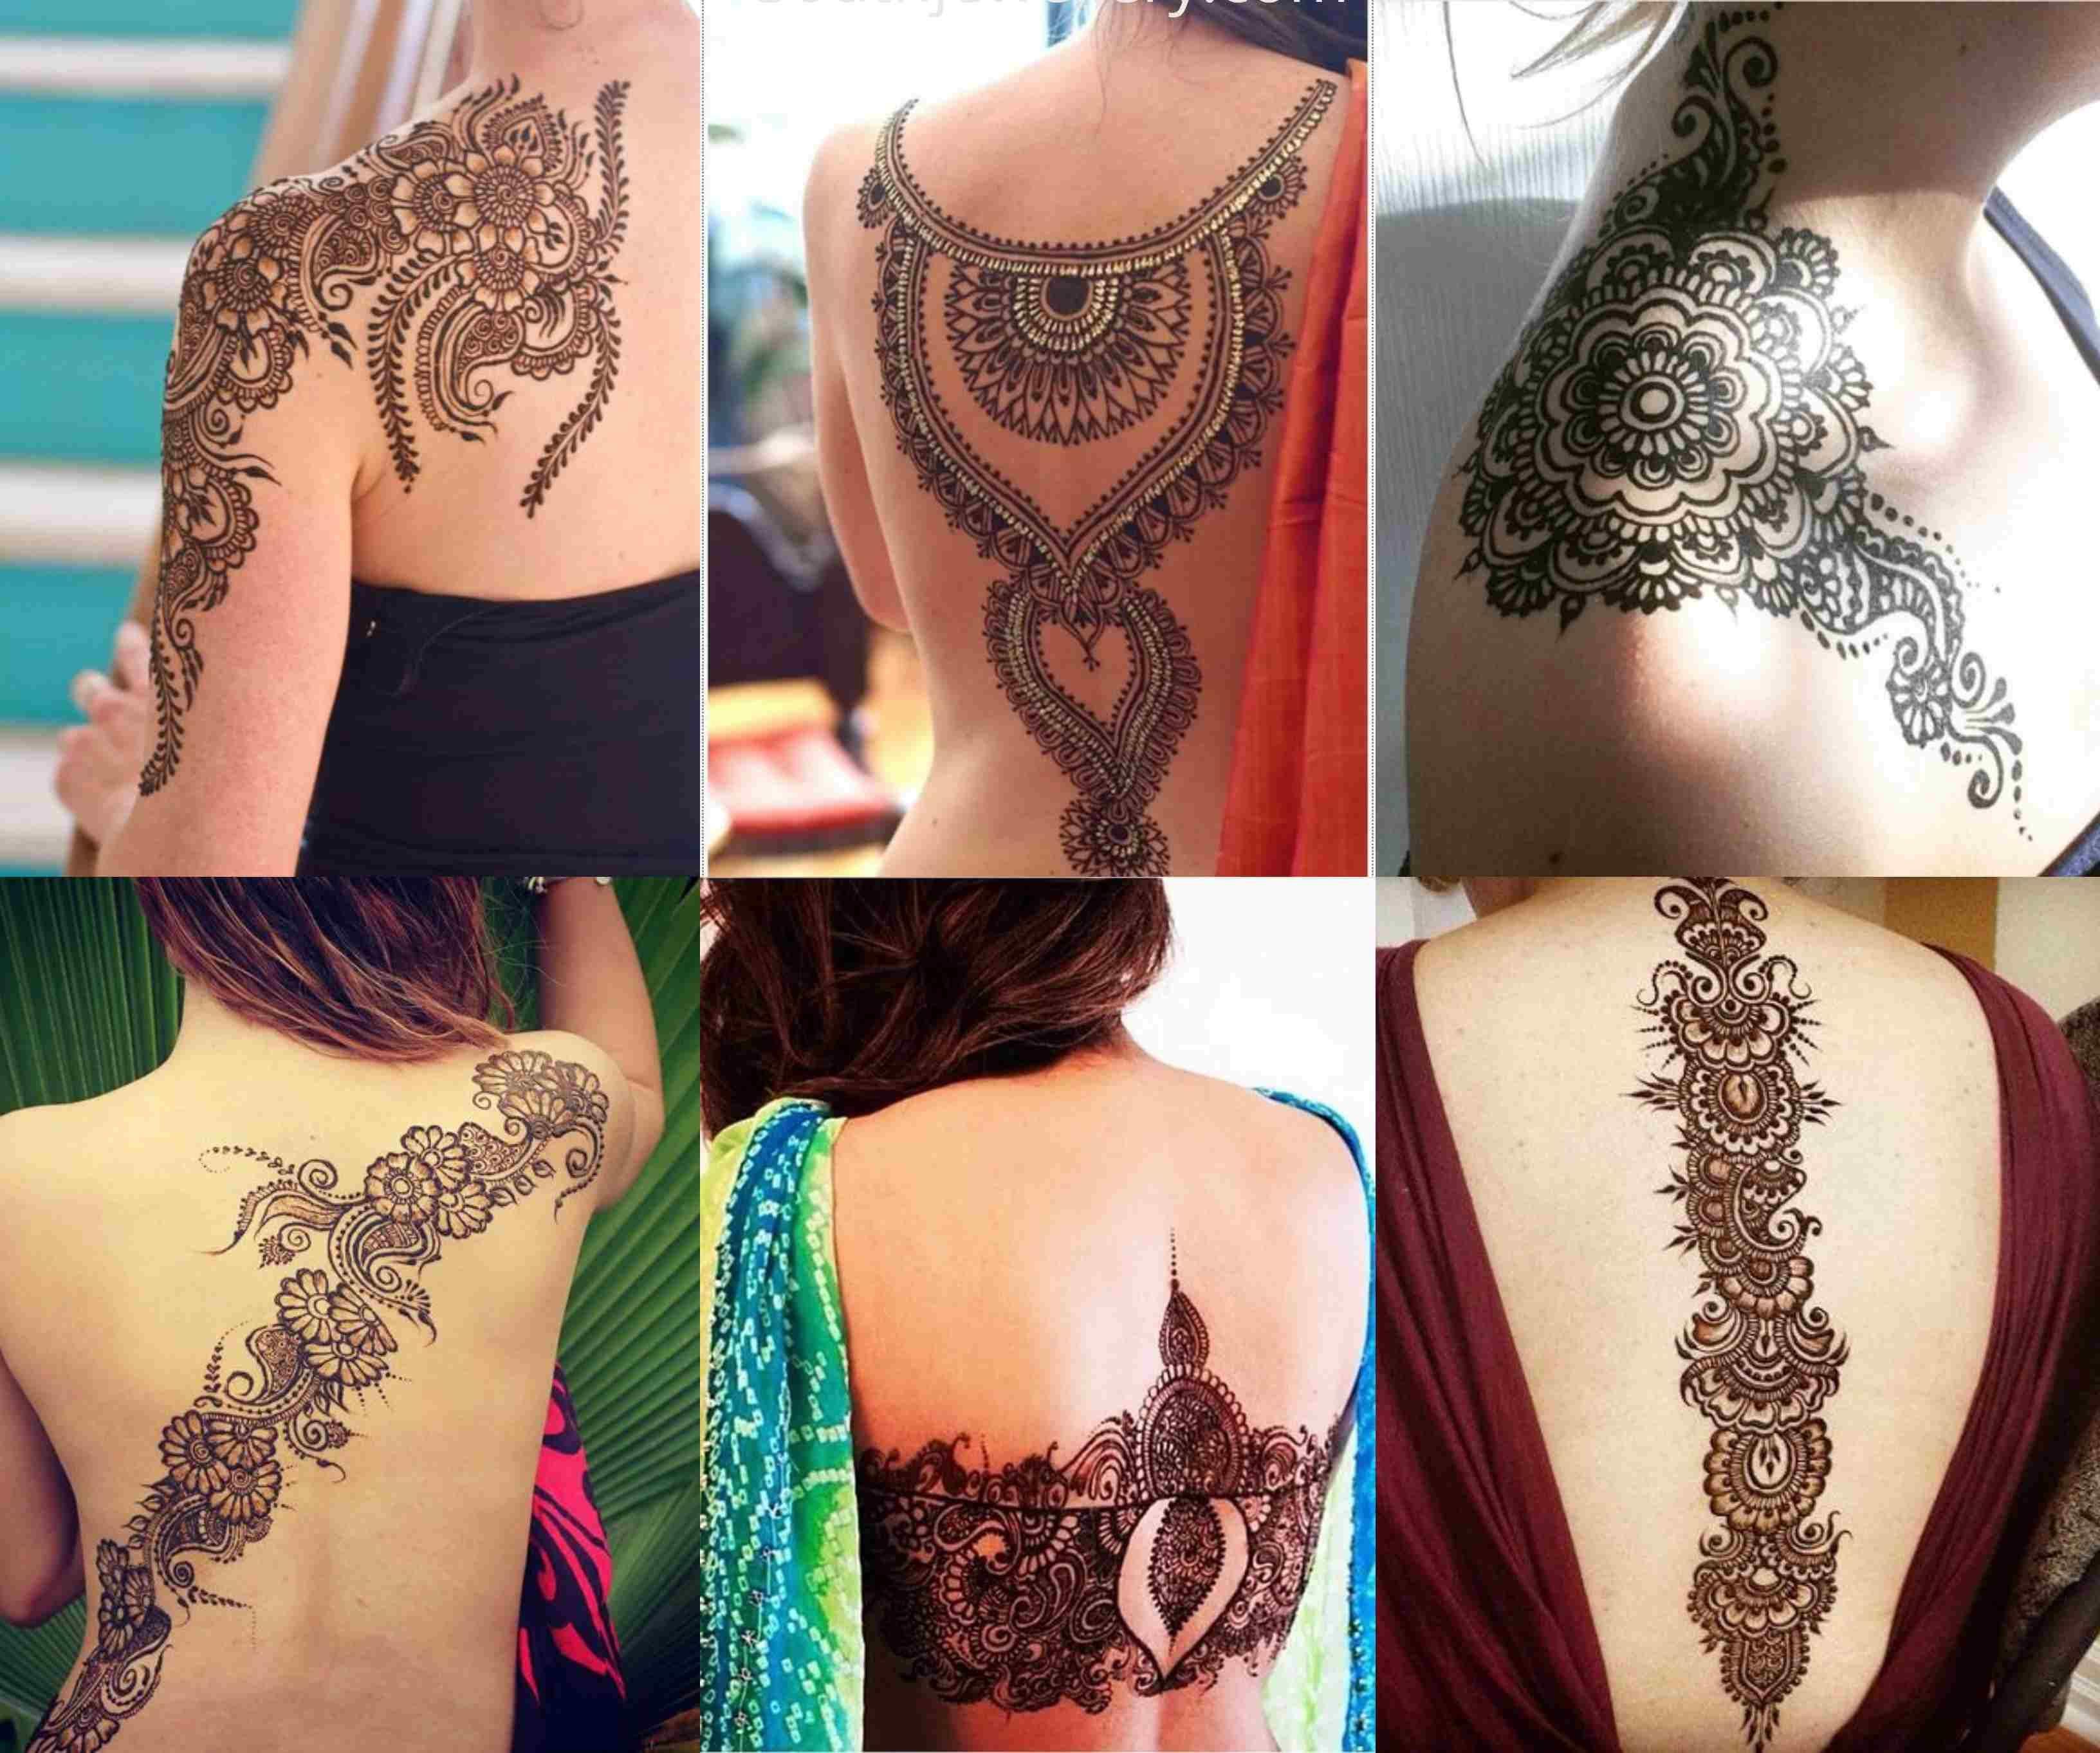 Full Body Mehndi Designs Indian Full Body Mehndi Pics Henna Tattoo Mehndi Designs Mehndi Designs For Hands Henna Tattoo Designs